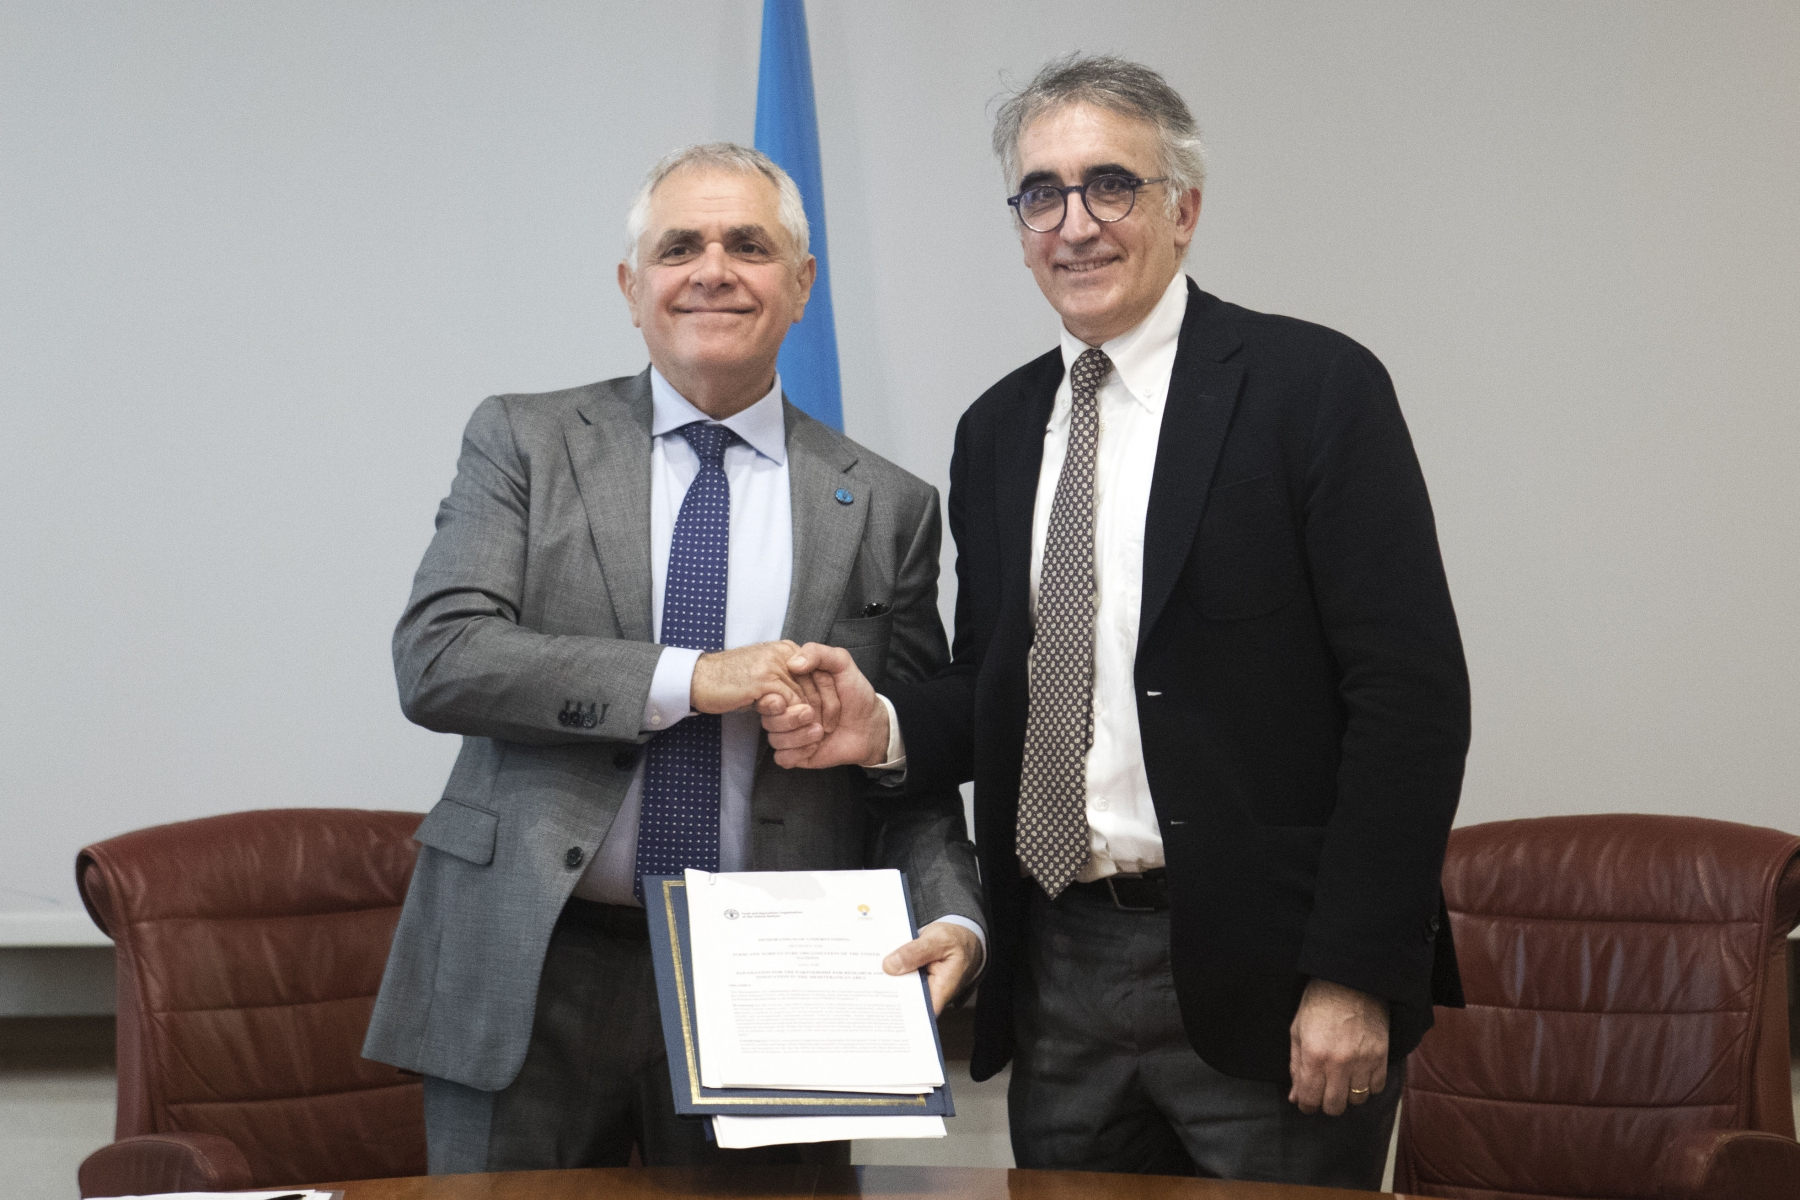 PRIMA - FAO 19.02.2019